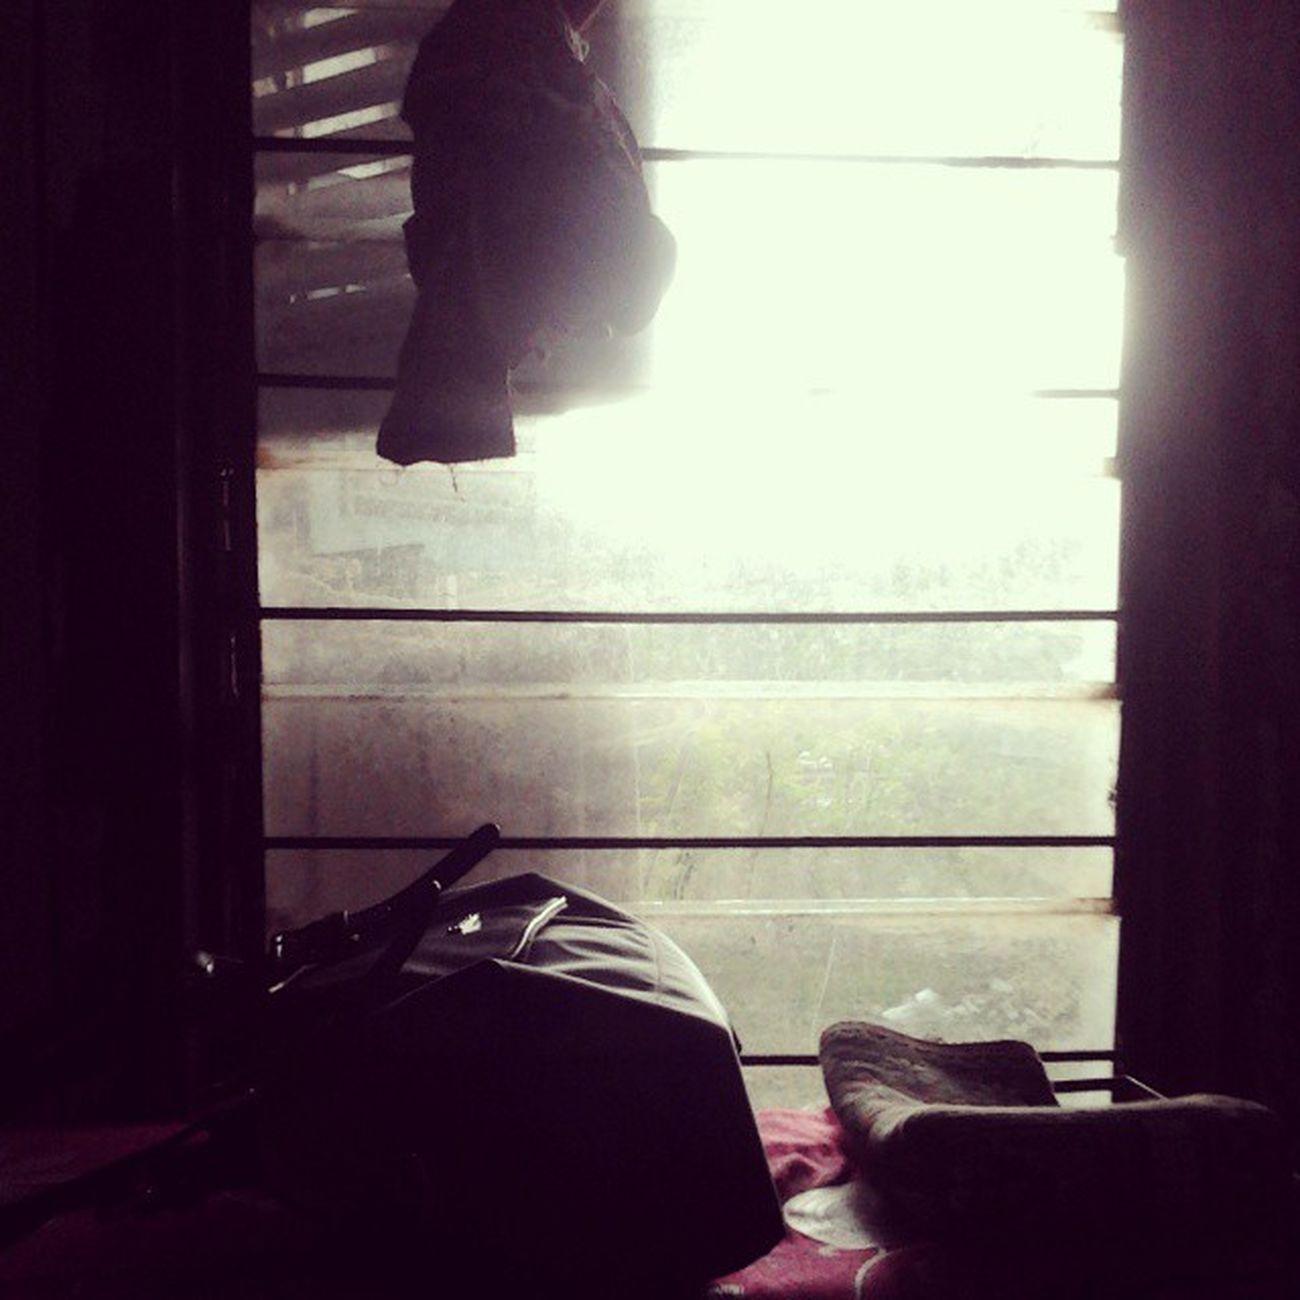 The shine through the vintage window. Shine Through Vintage Window Kaca Nako Jadul warisan leluhur sesepuh Budaya peradaban Culture